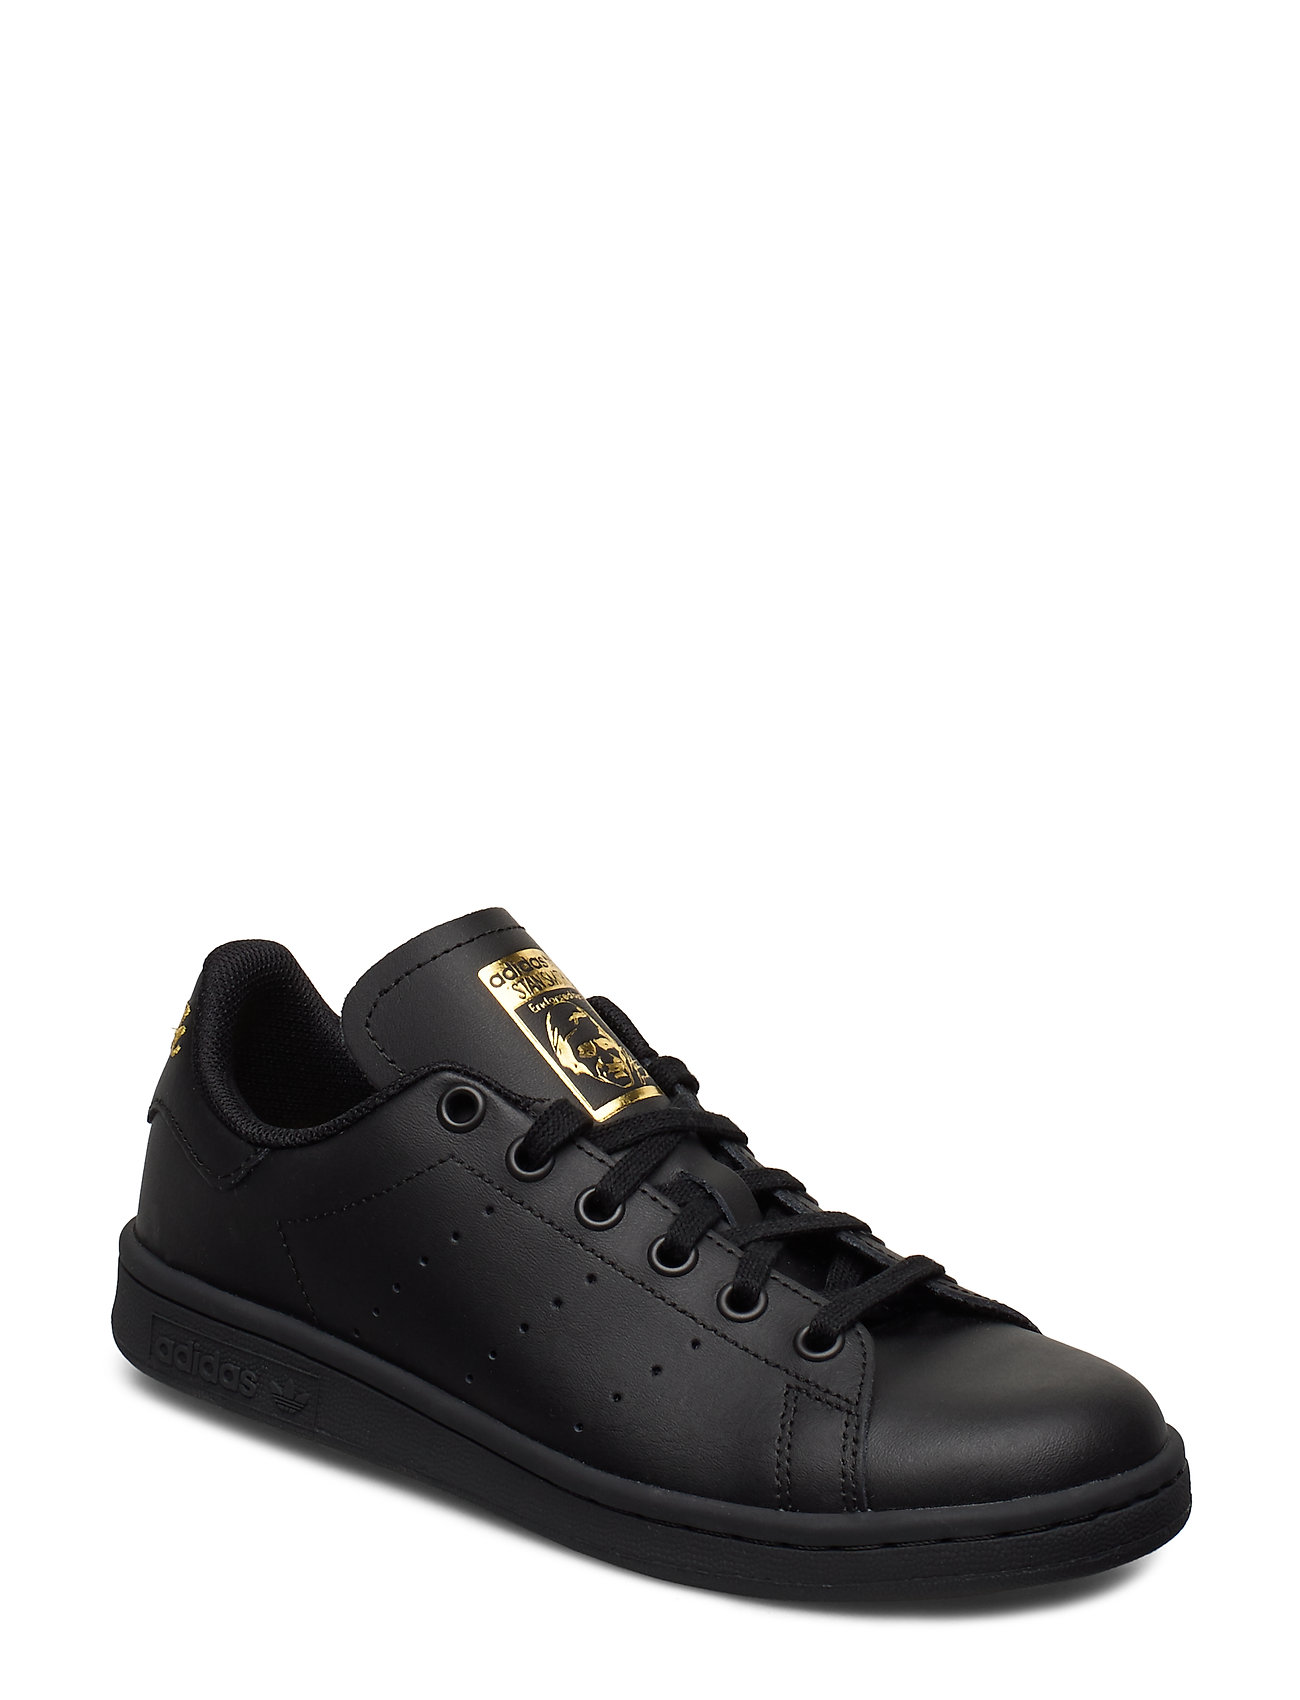 adidas Originals STAN SMITH J - CBLACK/CBLACK/GOLDMT